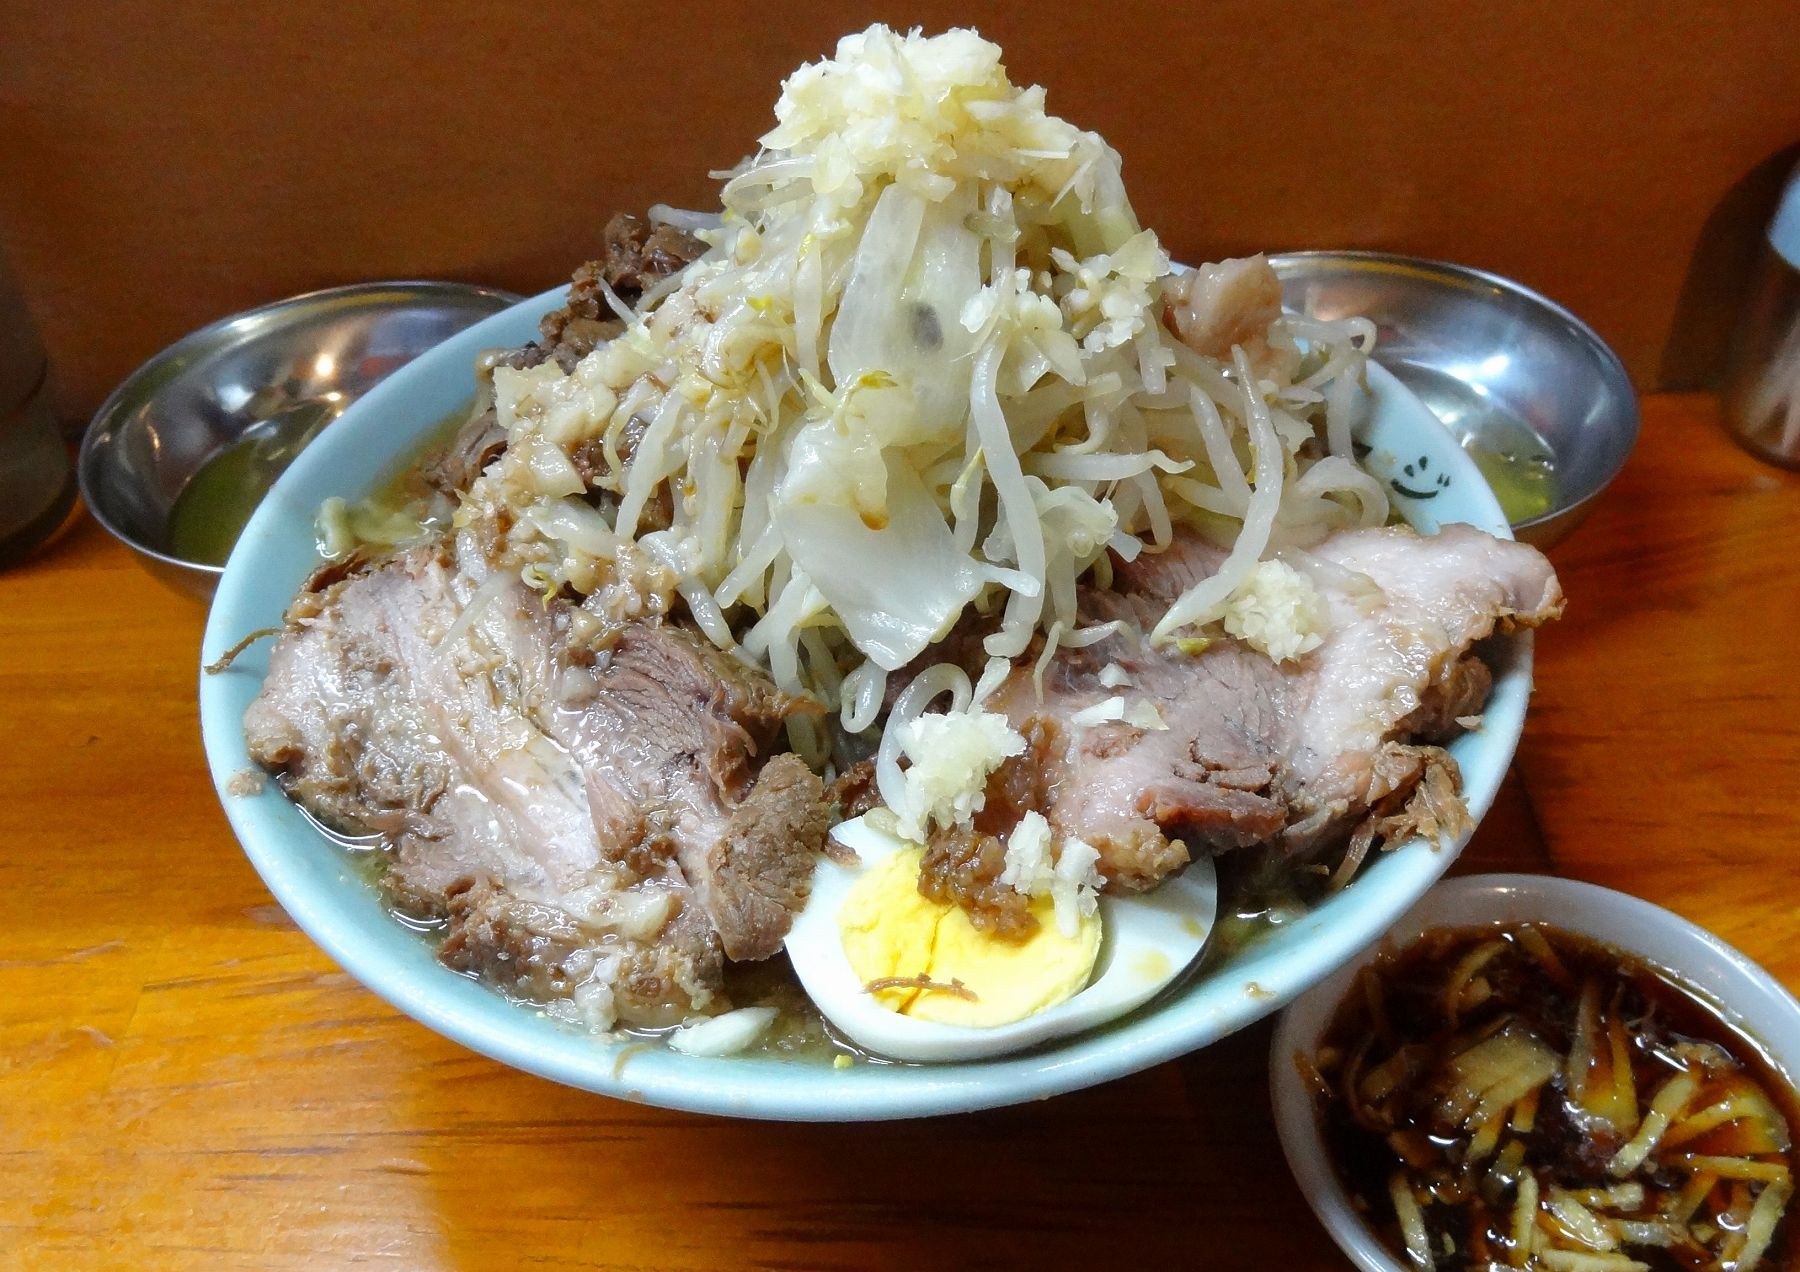 20120701002fujimaruitabashi.jpg